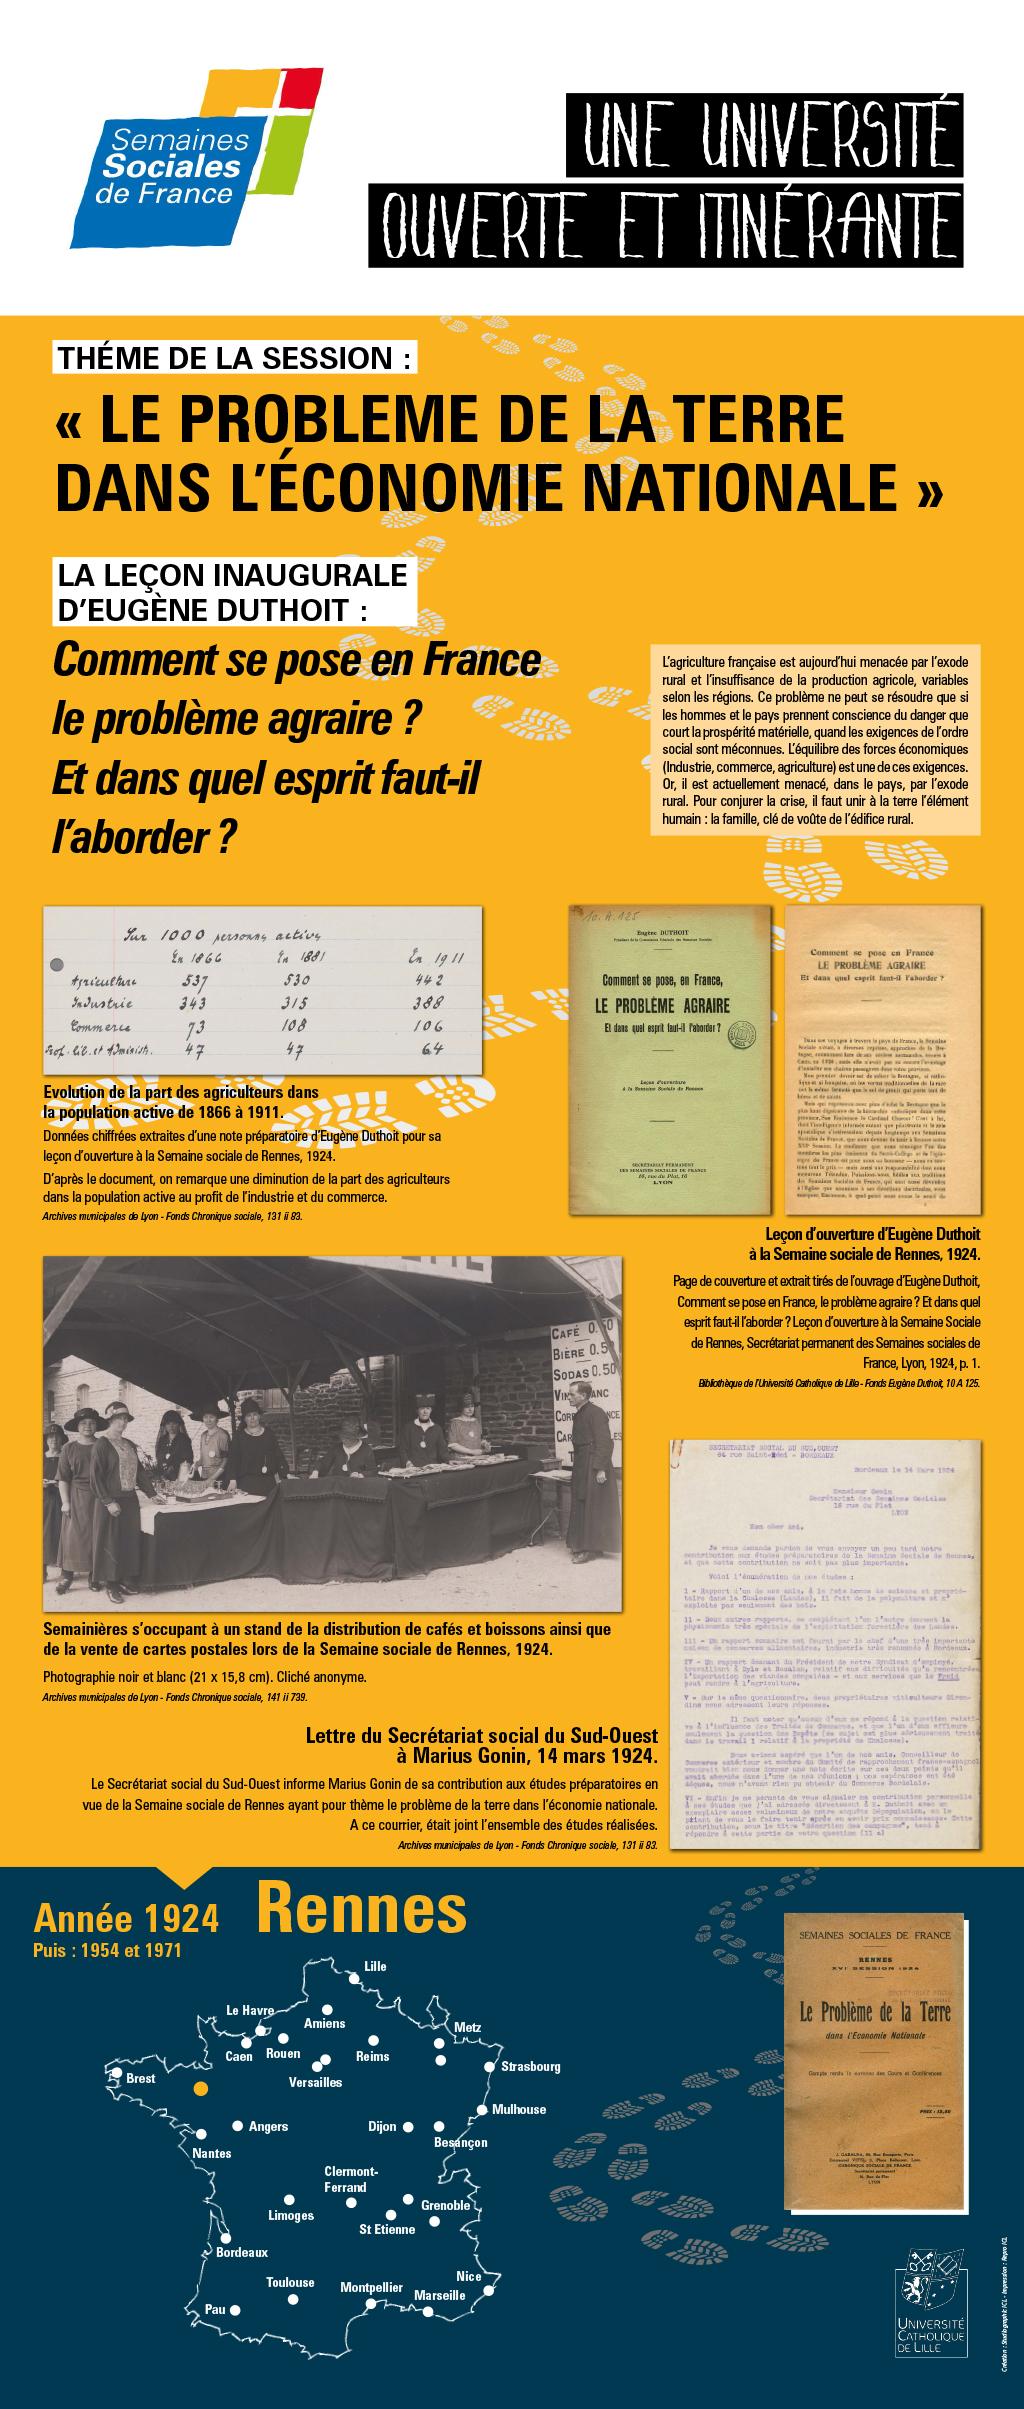 Rennes - 1924